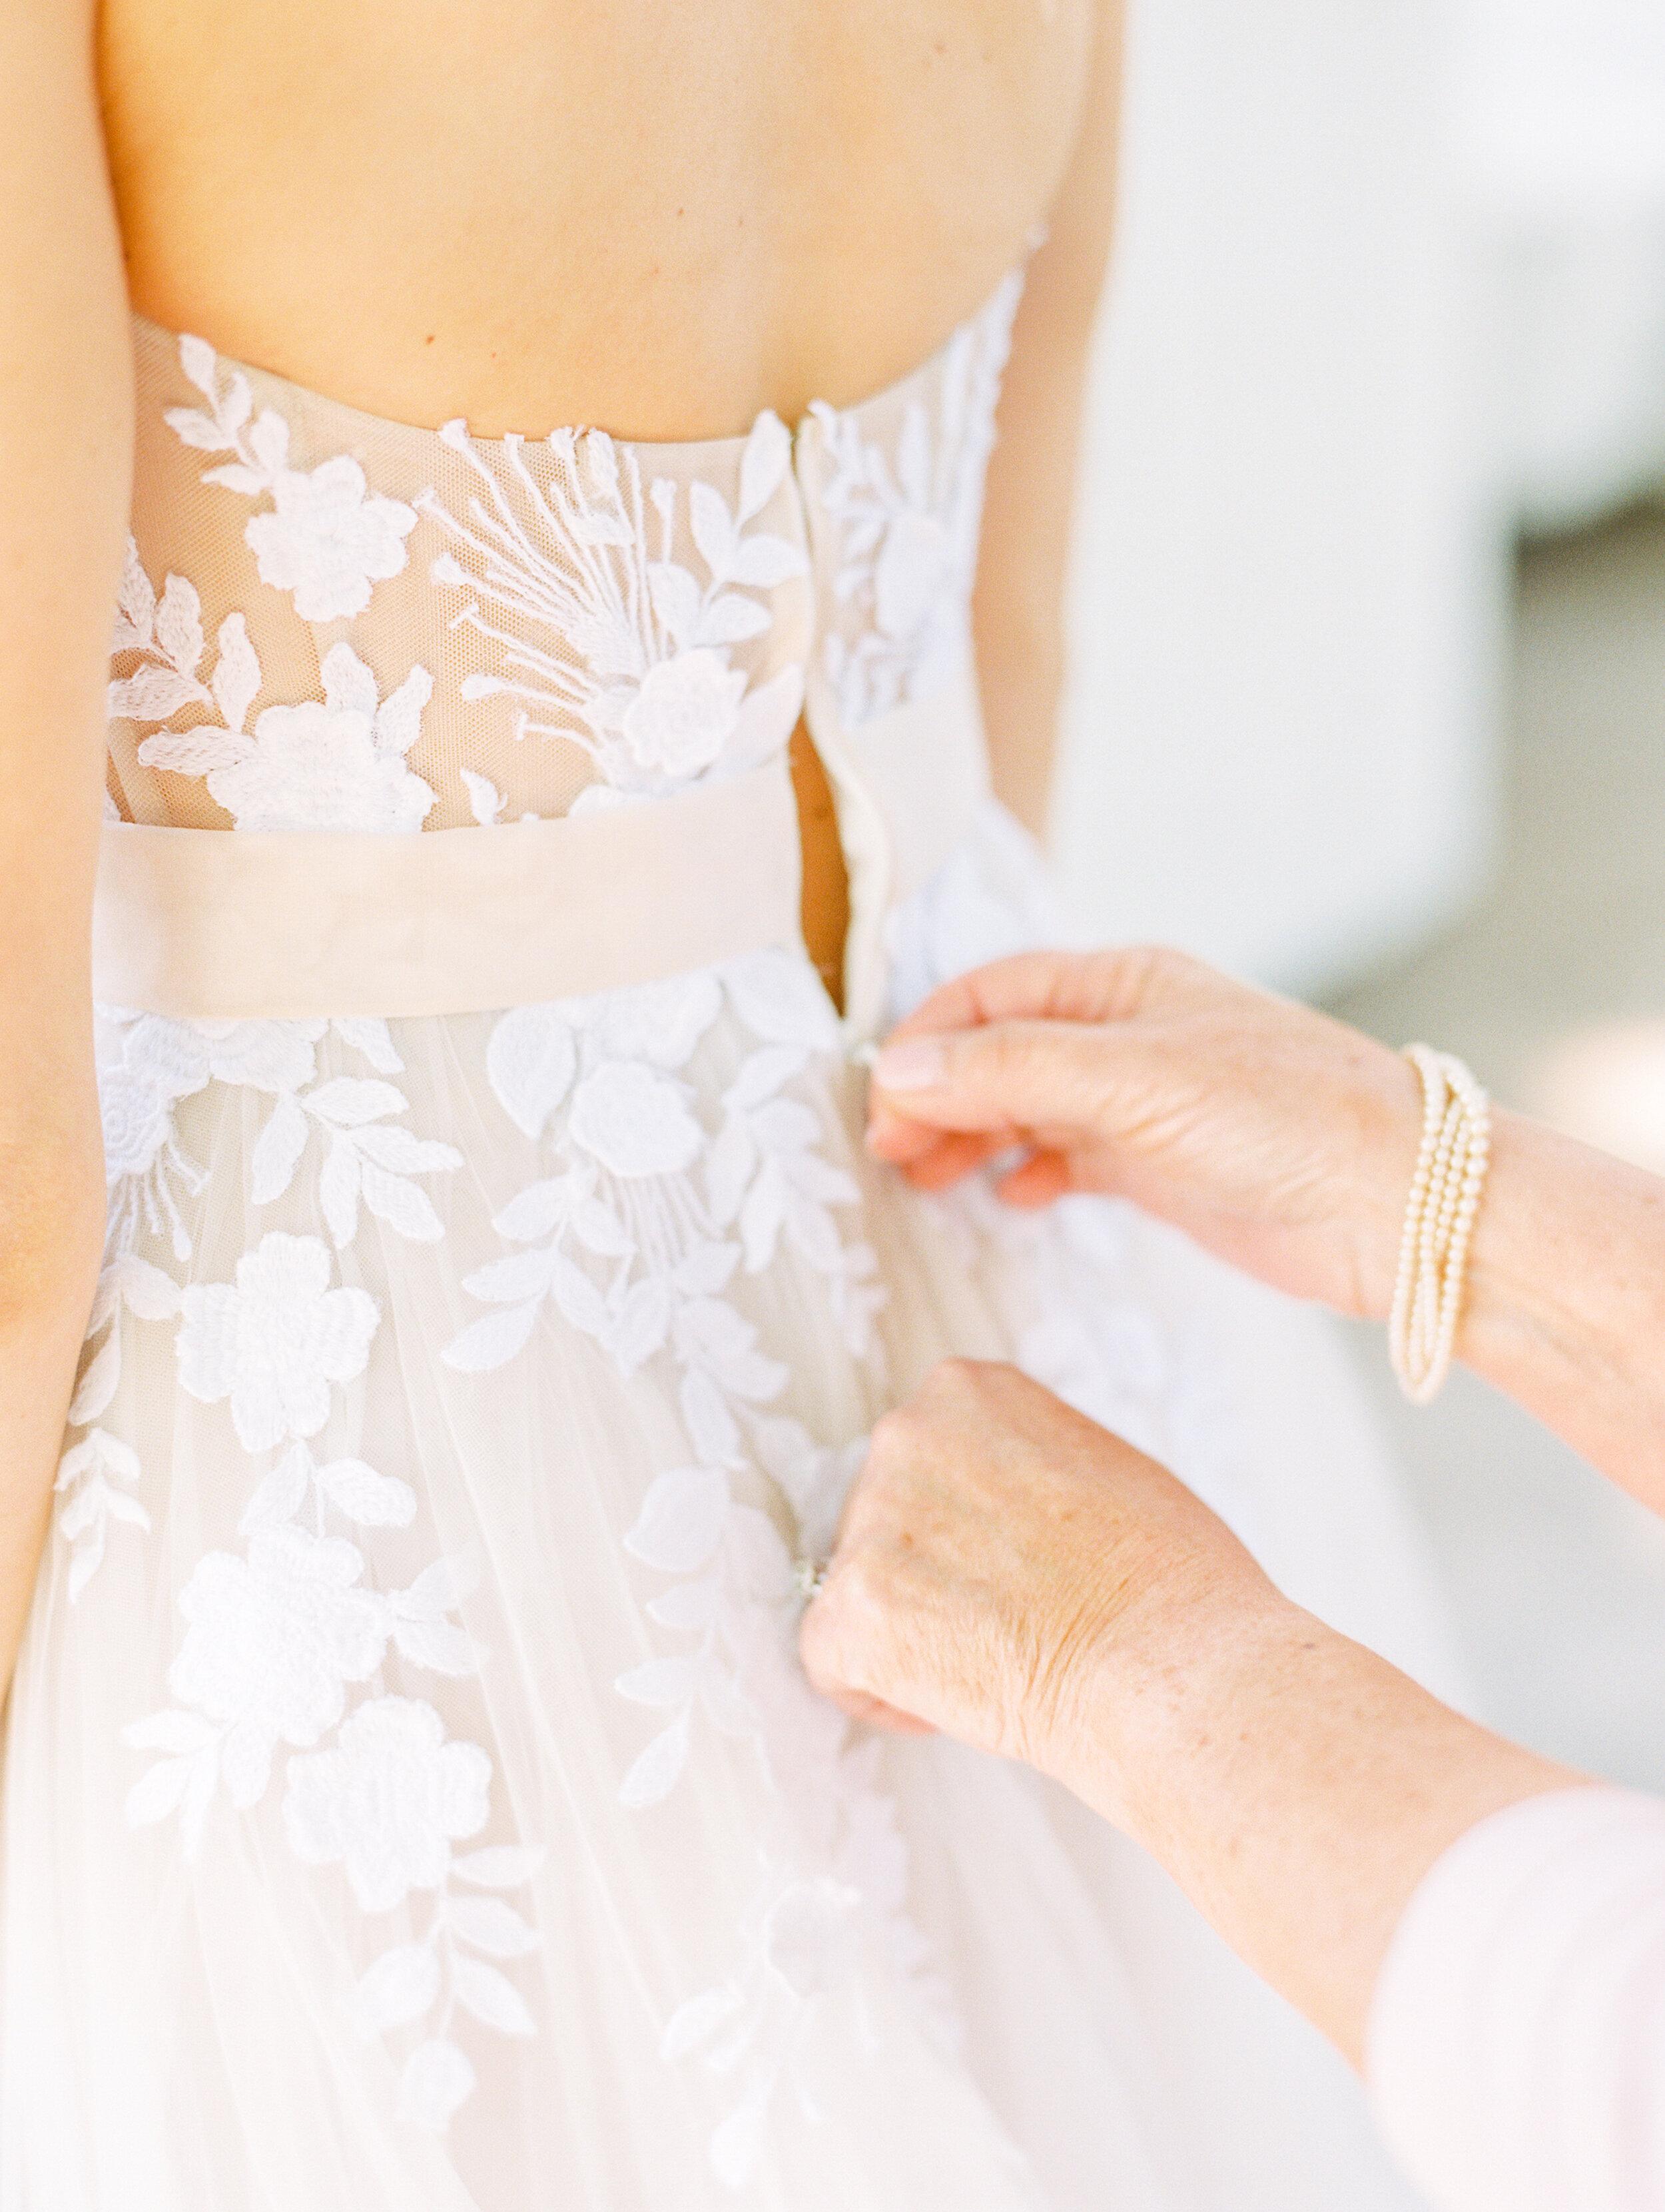 Steinlage+Wedding+Getting+Ready-96.jpg